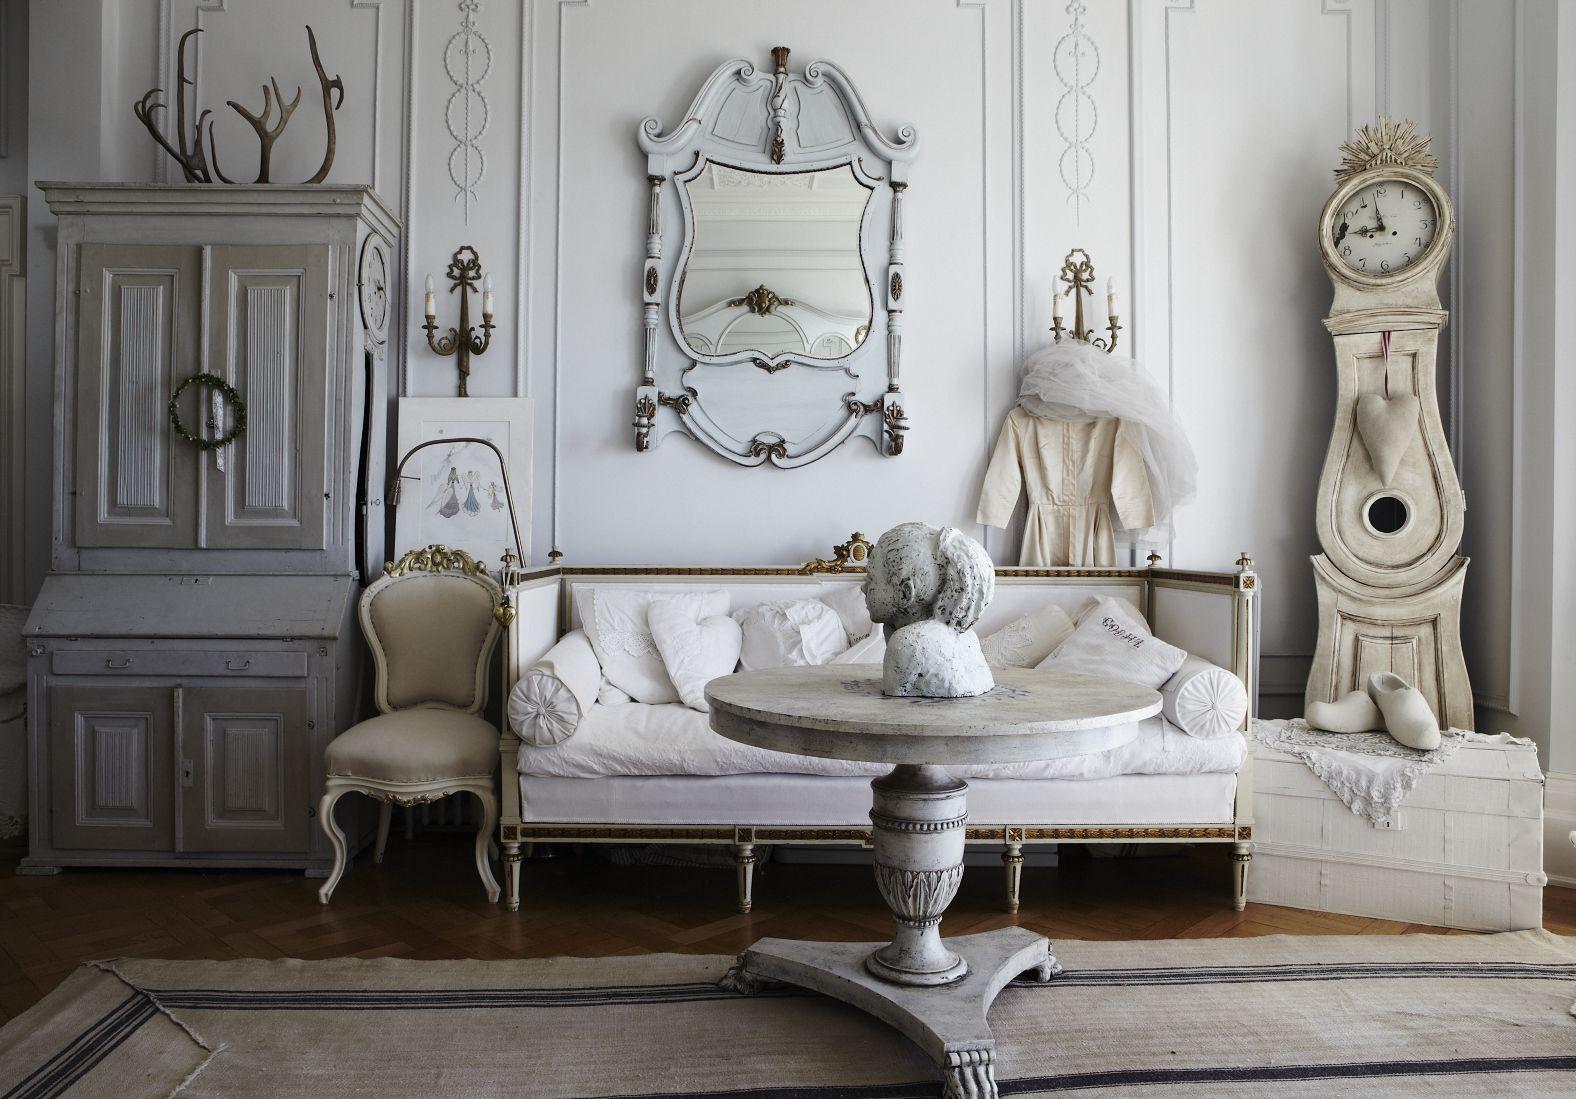 shabby chic furniture interior design 25 cozy shabby chic furniture ideas for your home | top home designs ECETSFX